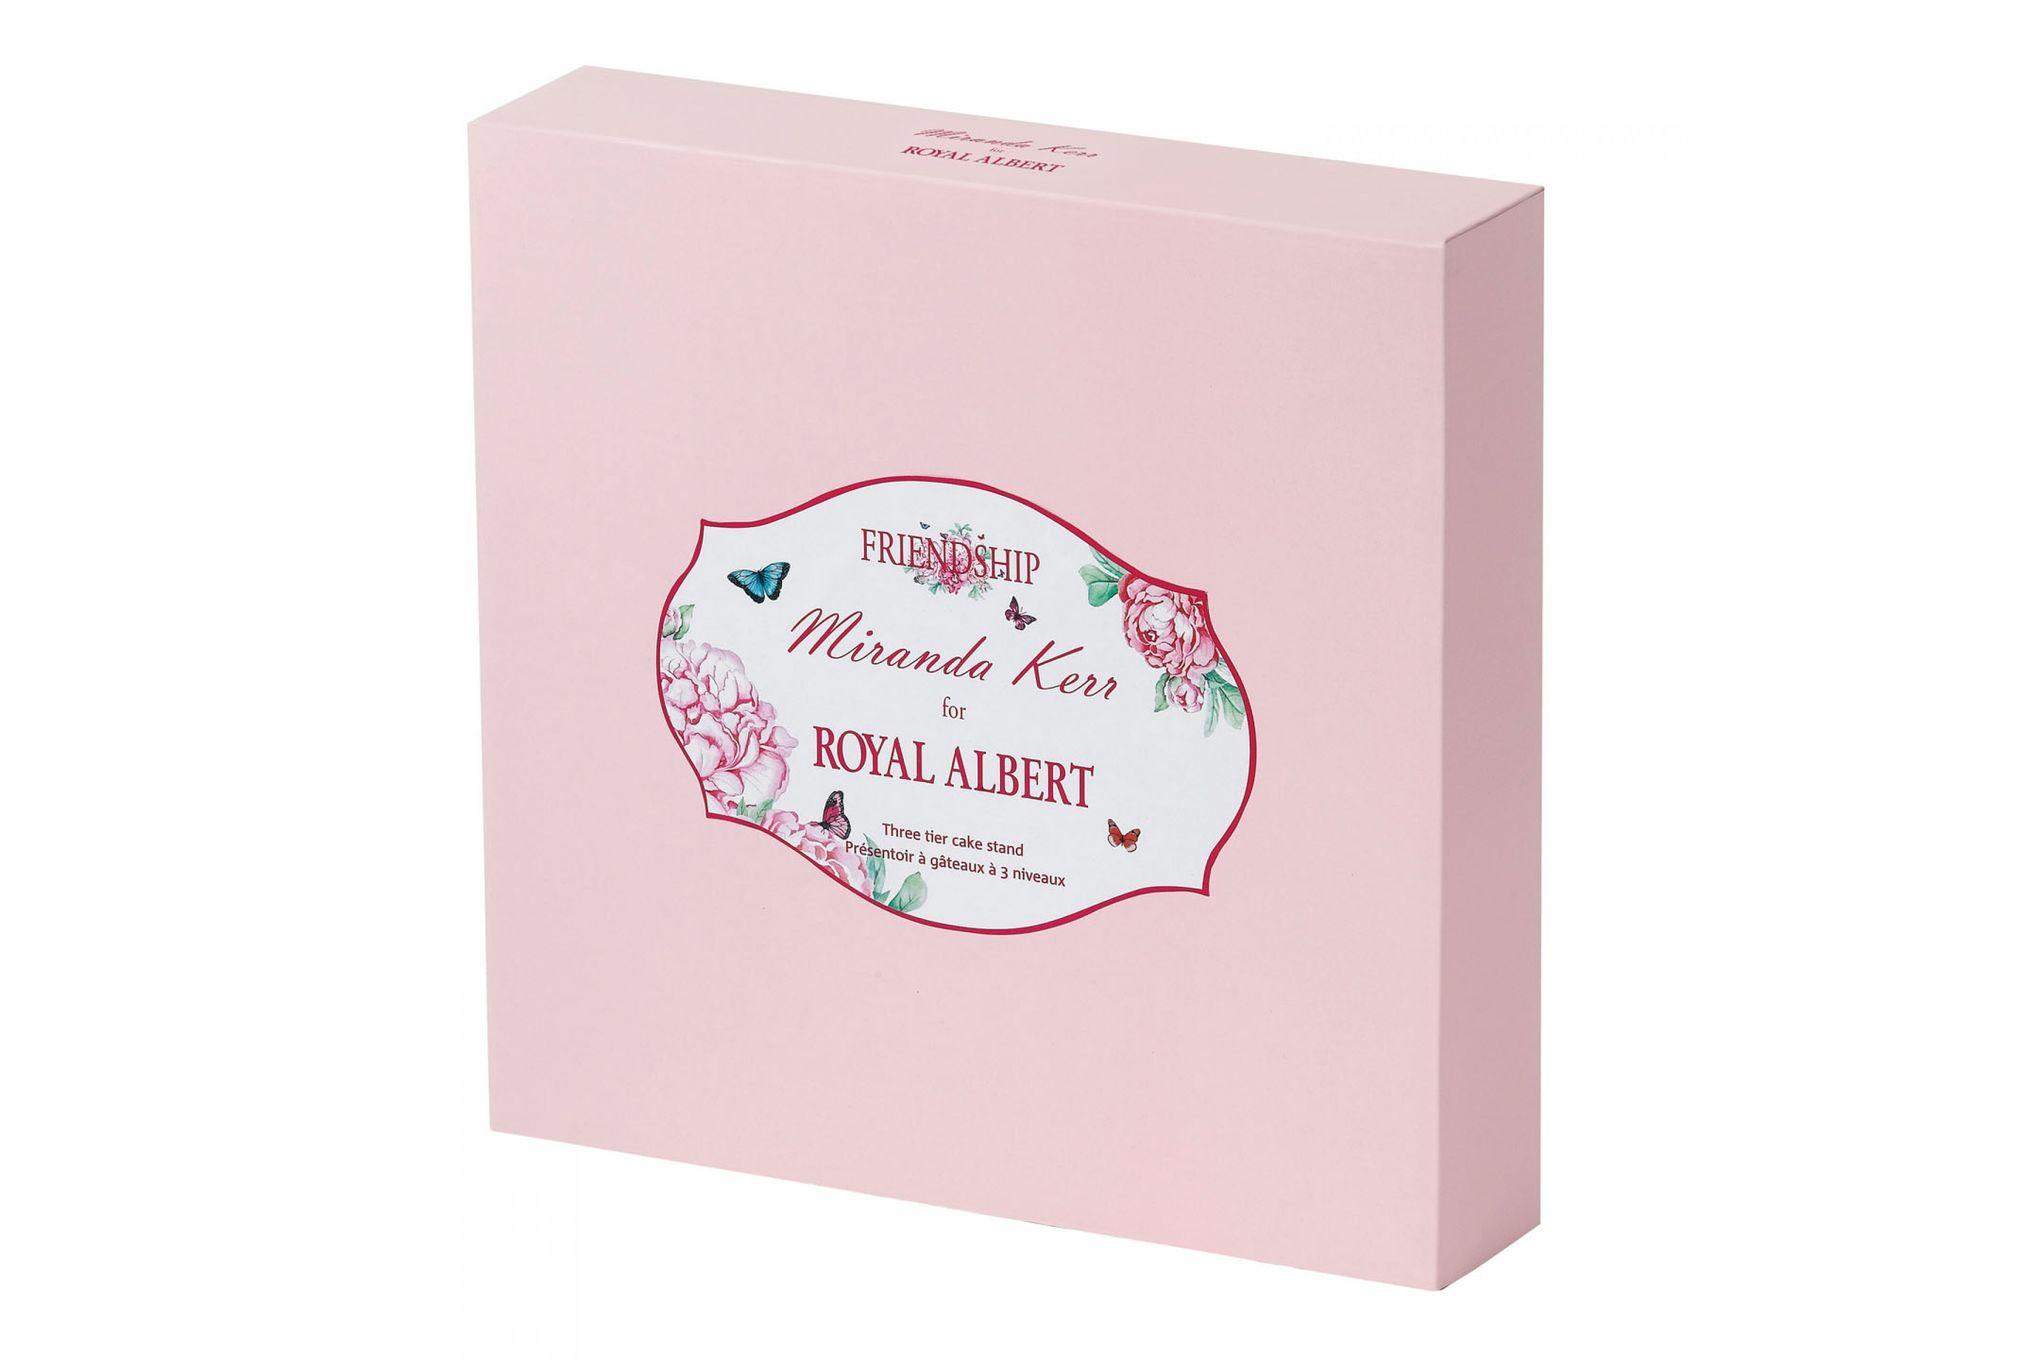 Miranda Kerr for Royal Albert Gift Sets 3 Tier Cake Stand thumb 2